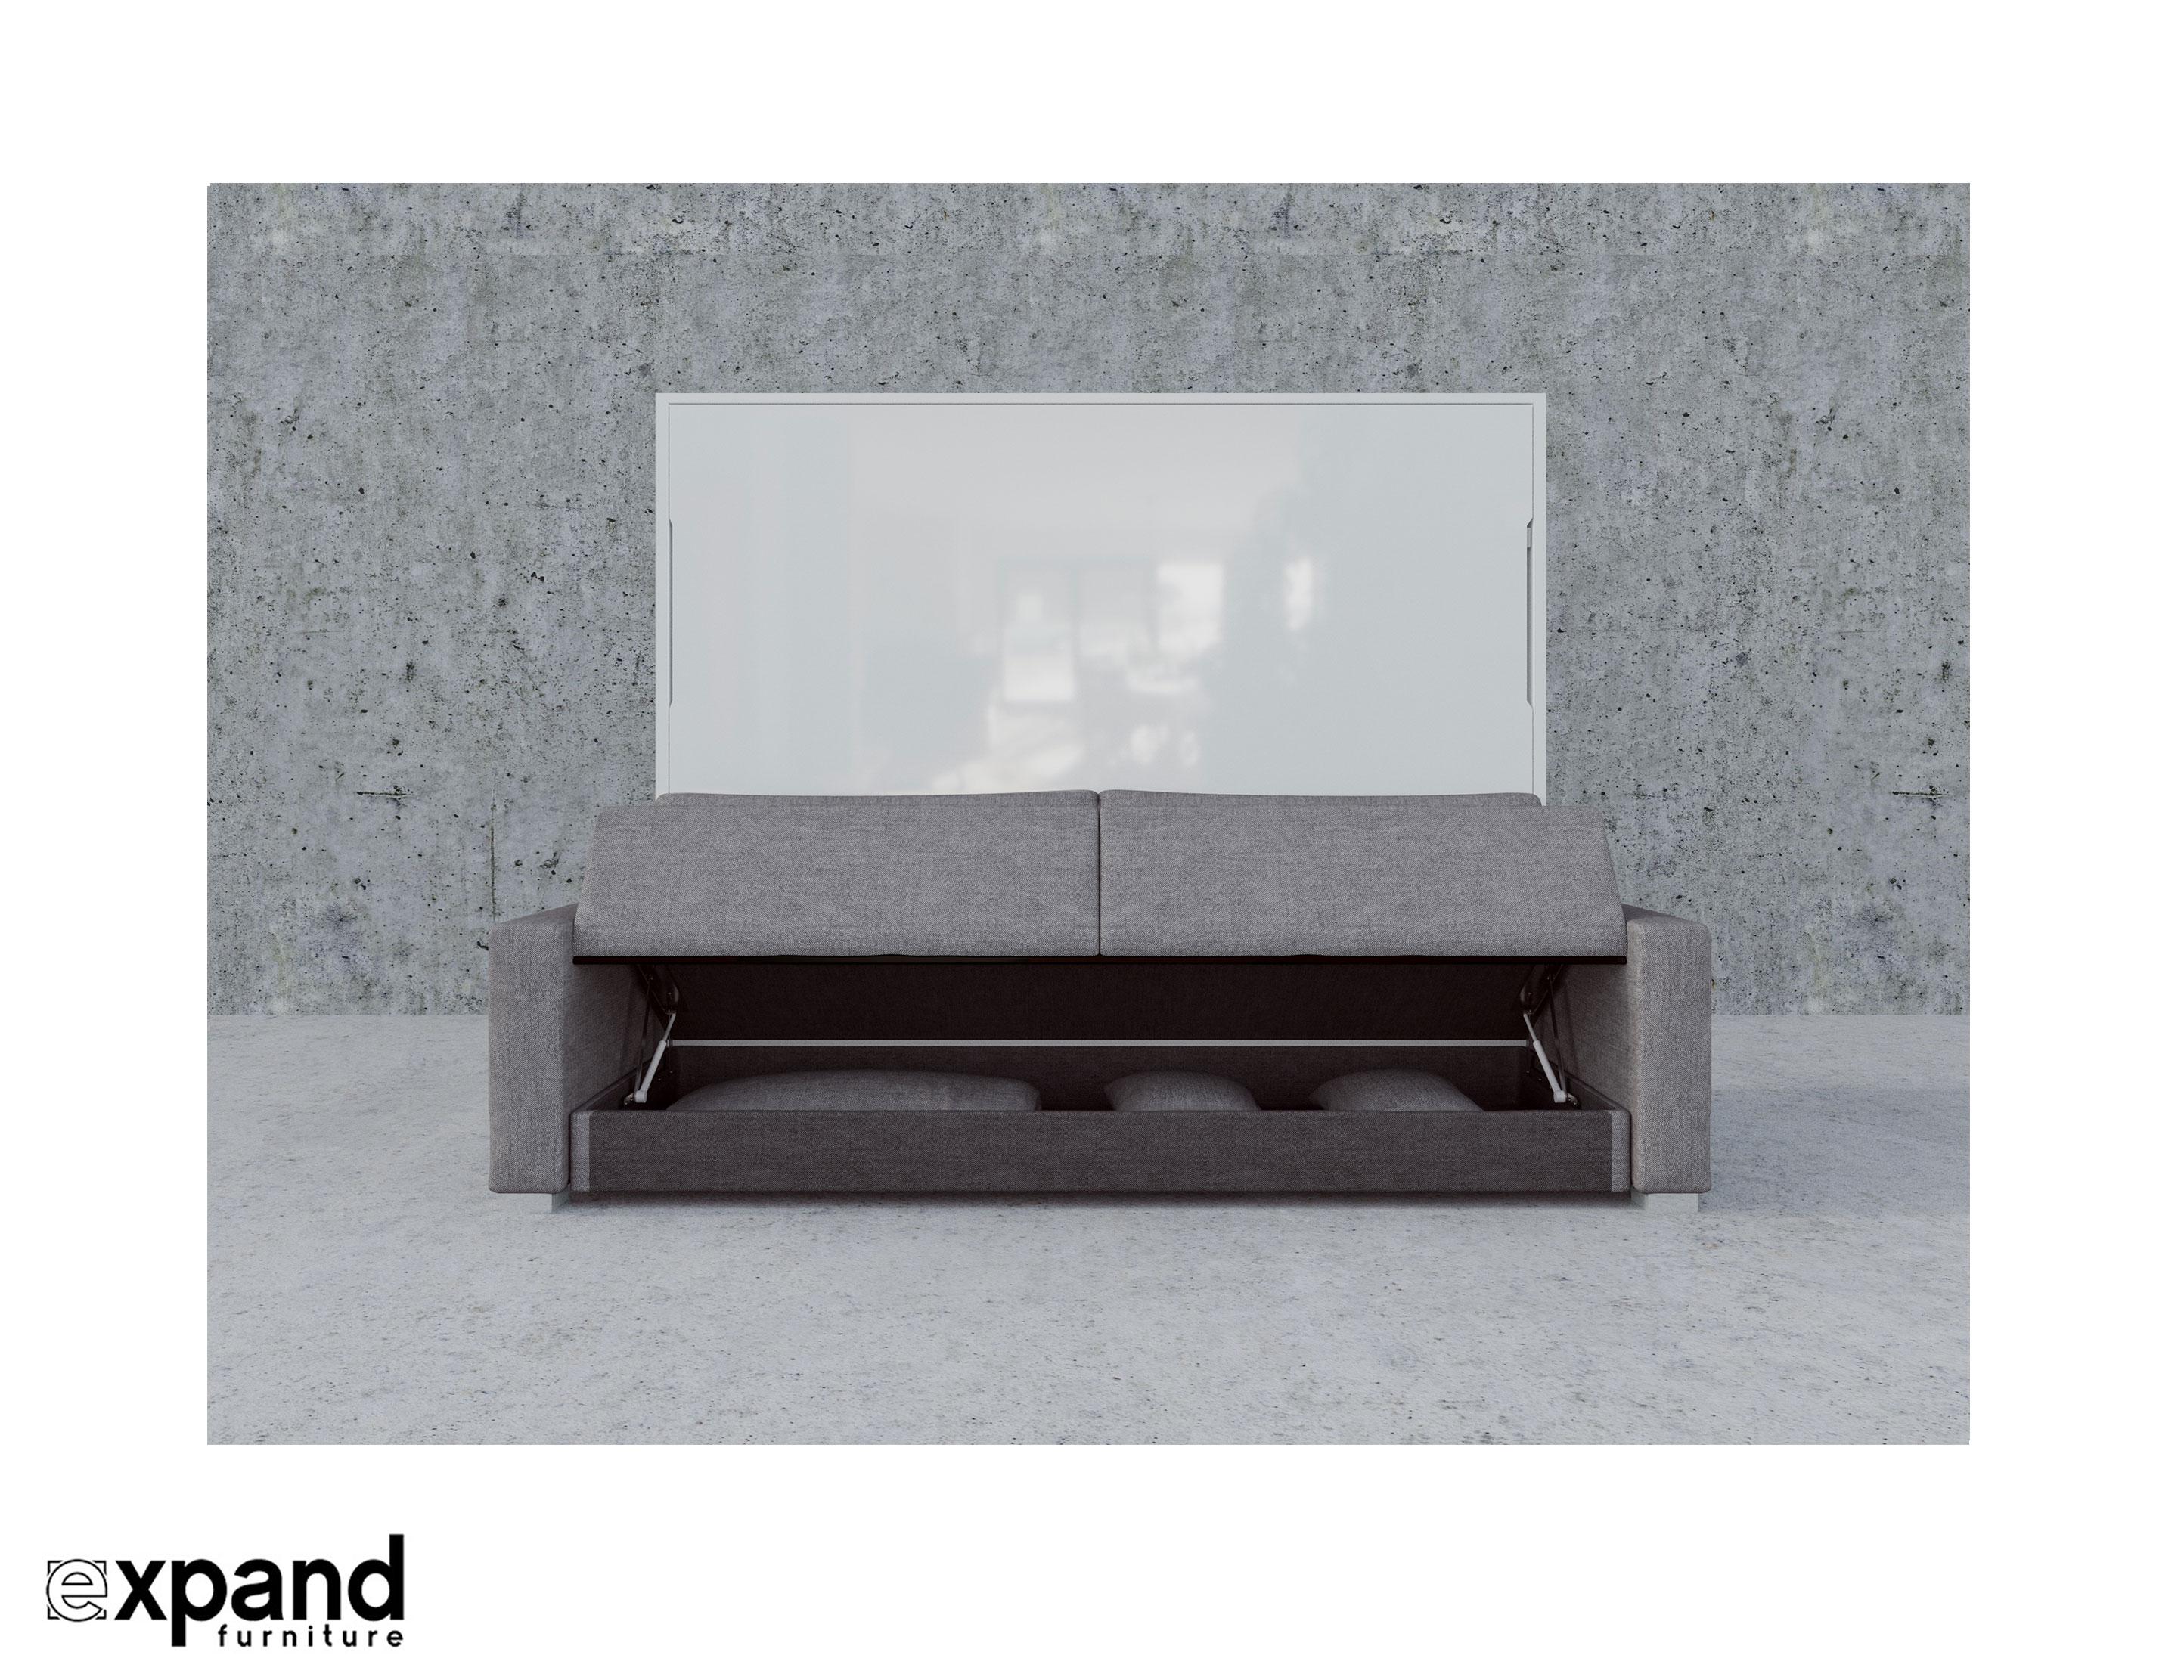 Fullsize Of Sofa With Storage